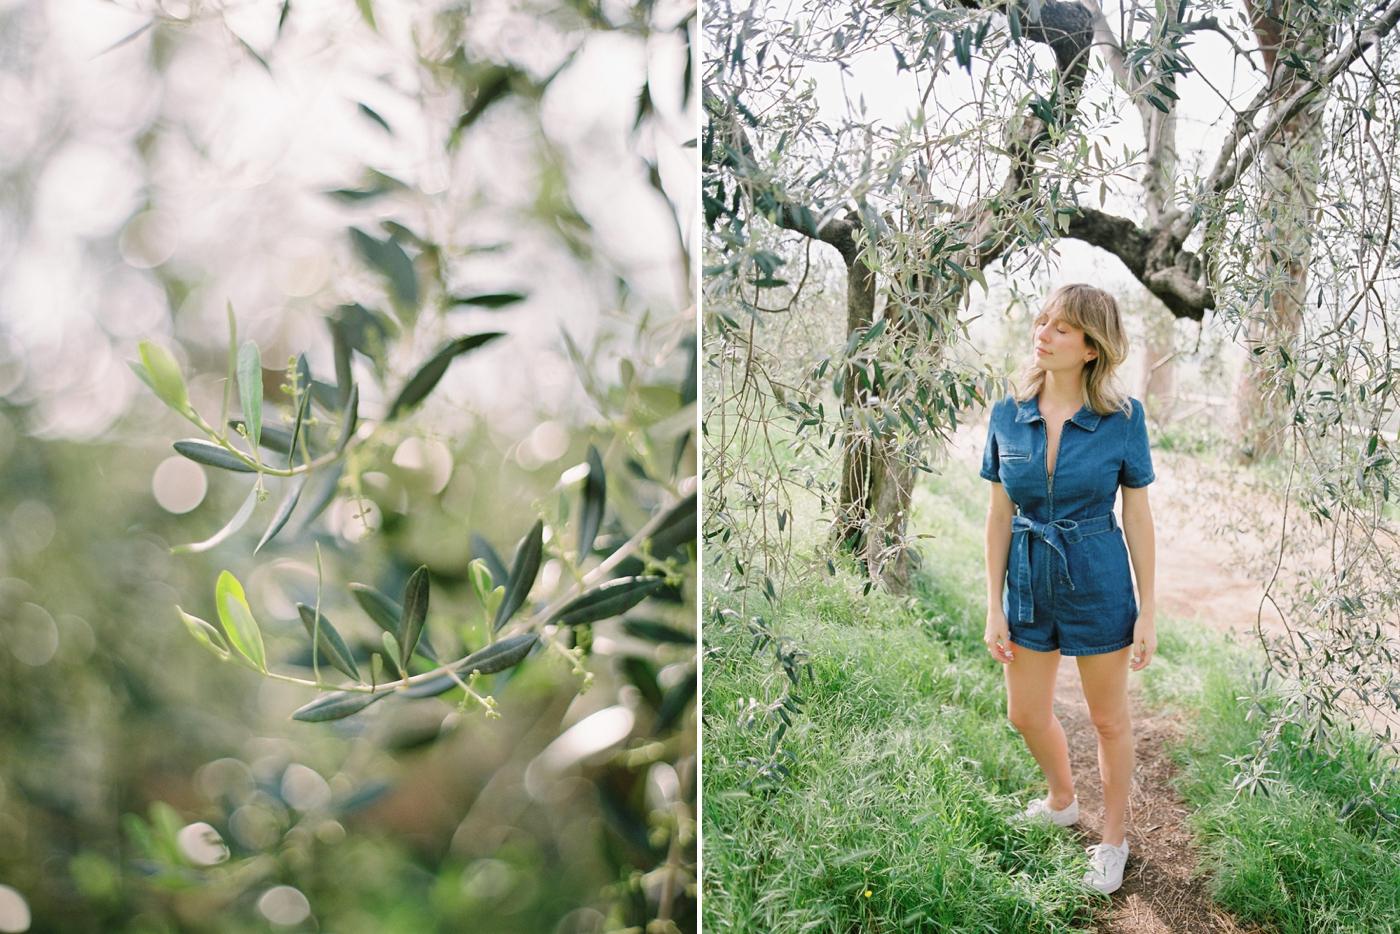 Italy wedding photographers   couples session fashion blogger life set sail   Justine milton fine art film photographer